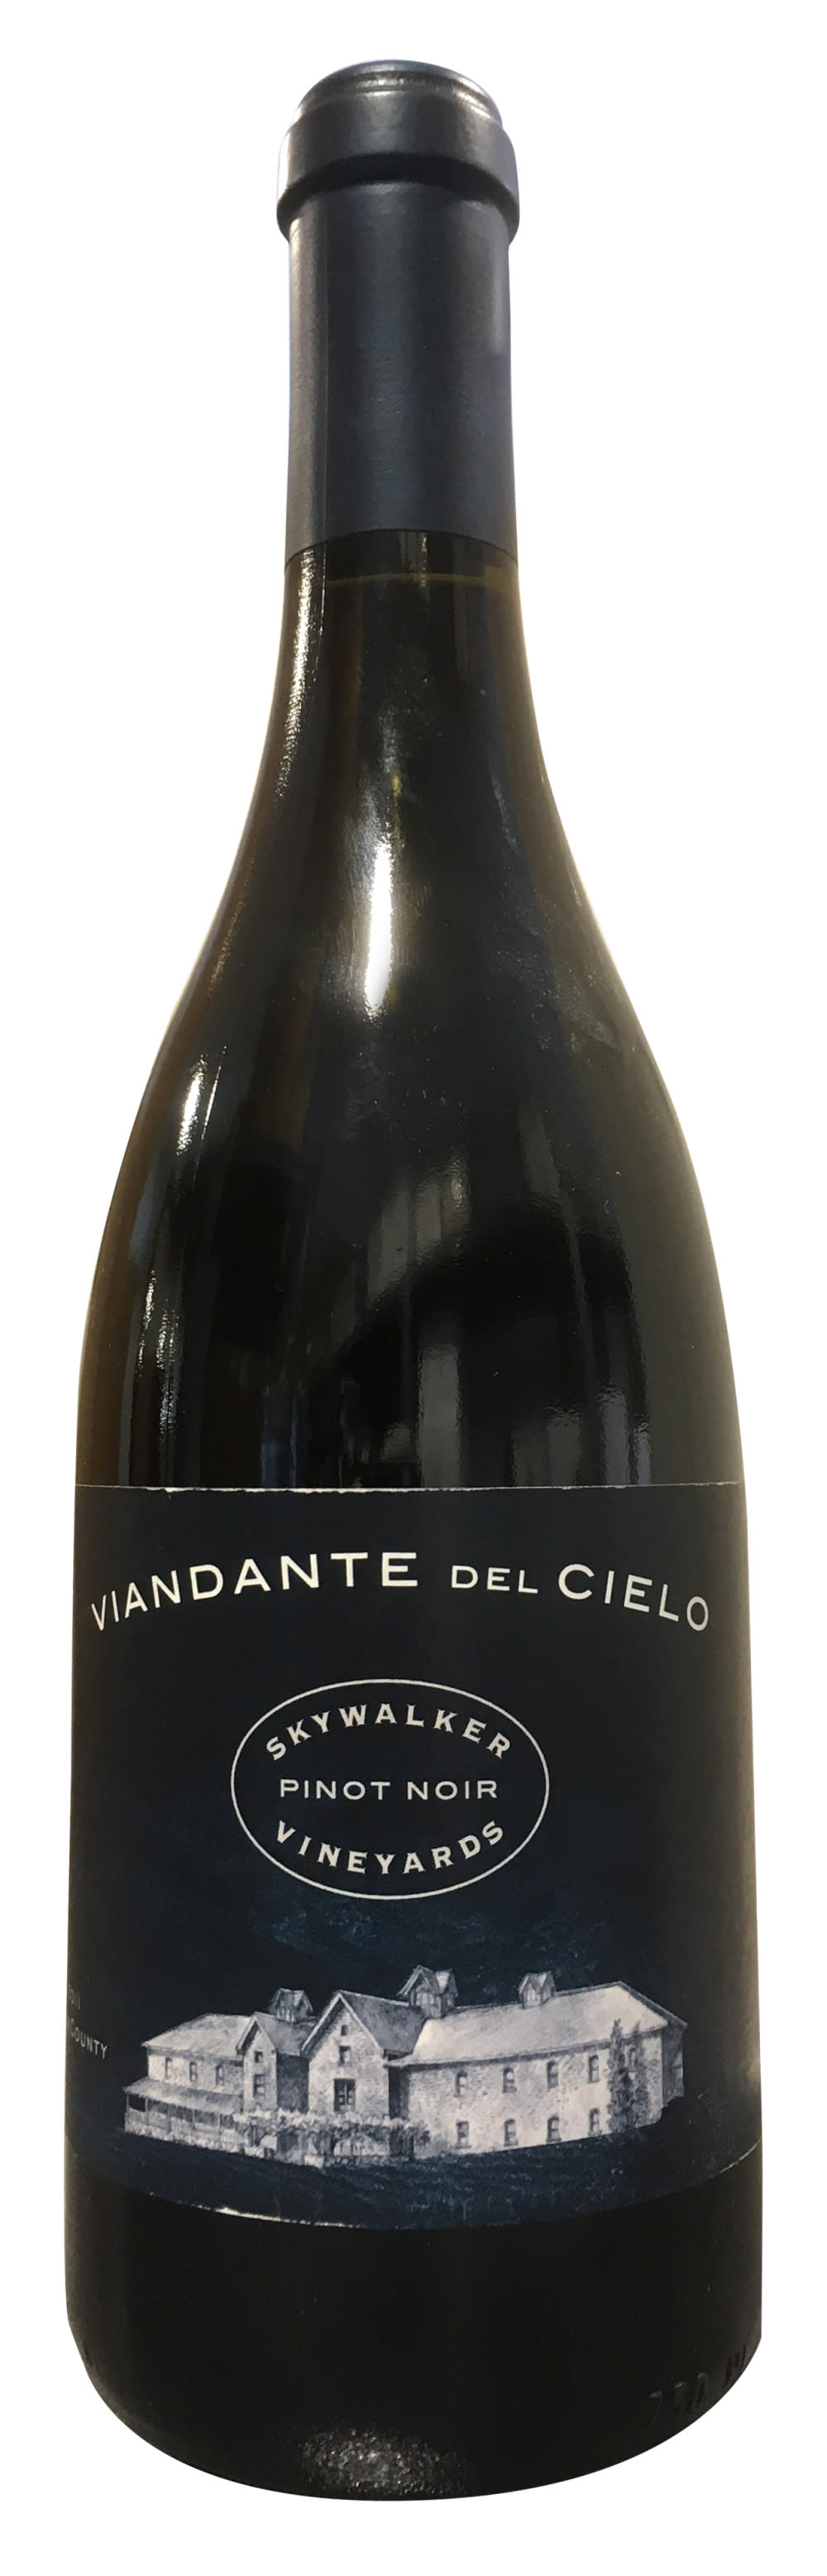 Skywalker Viandante Del Cielo Pinot Noir 2011